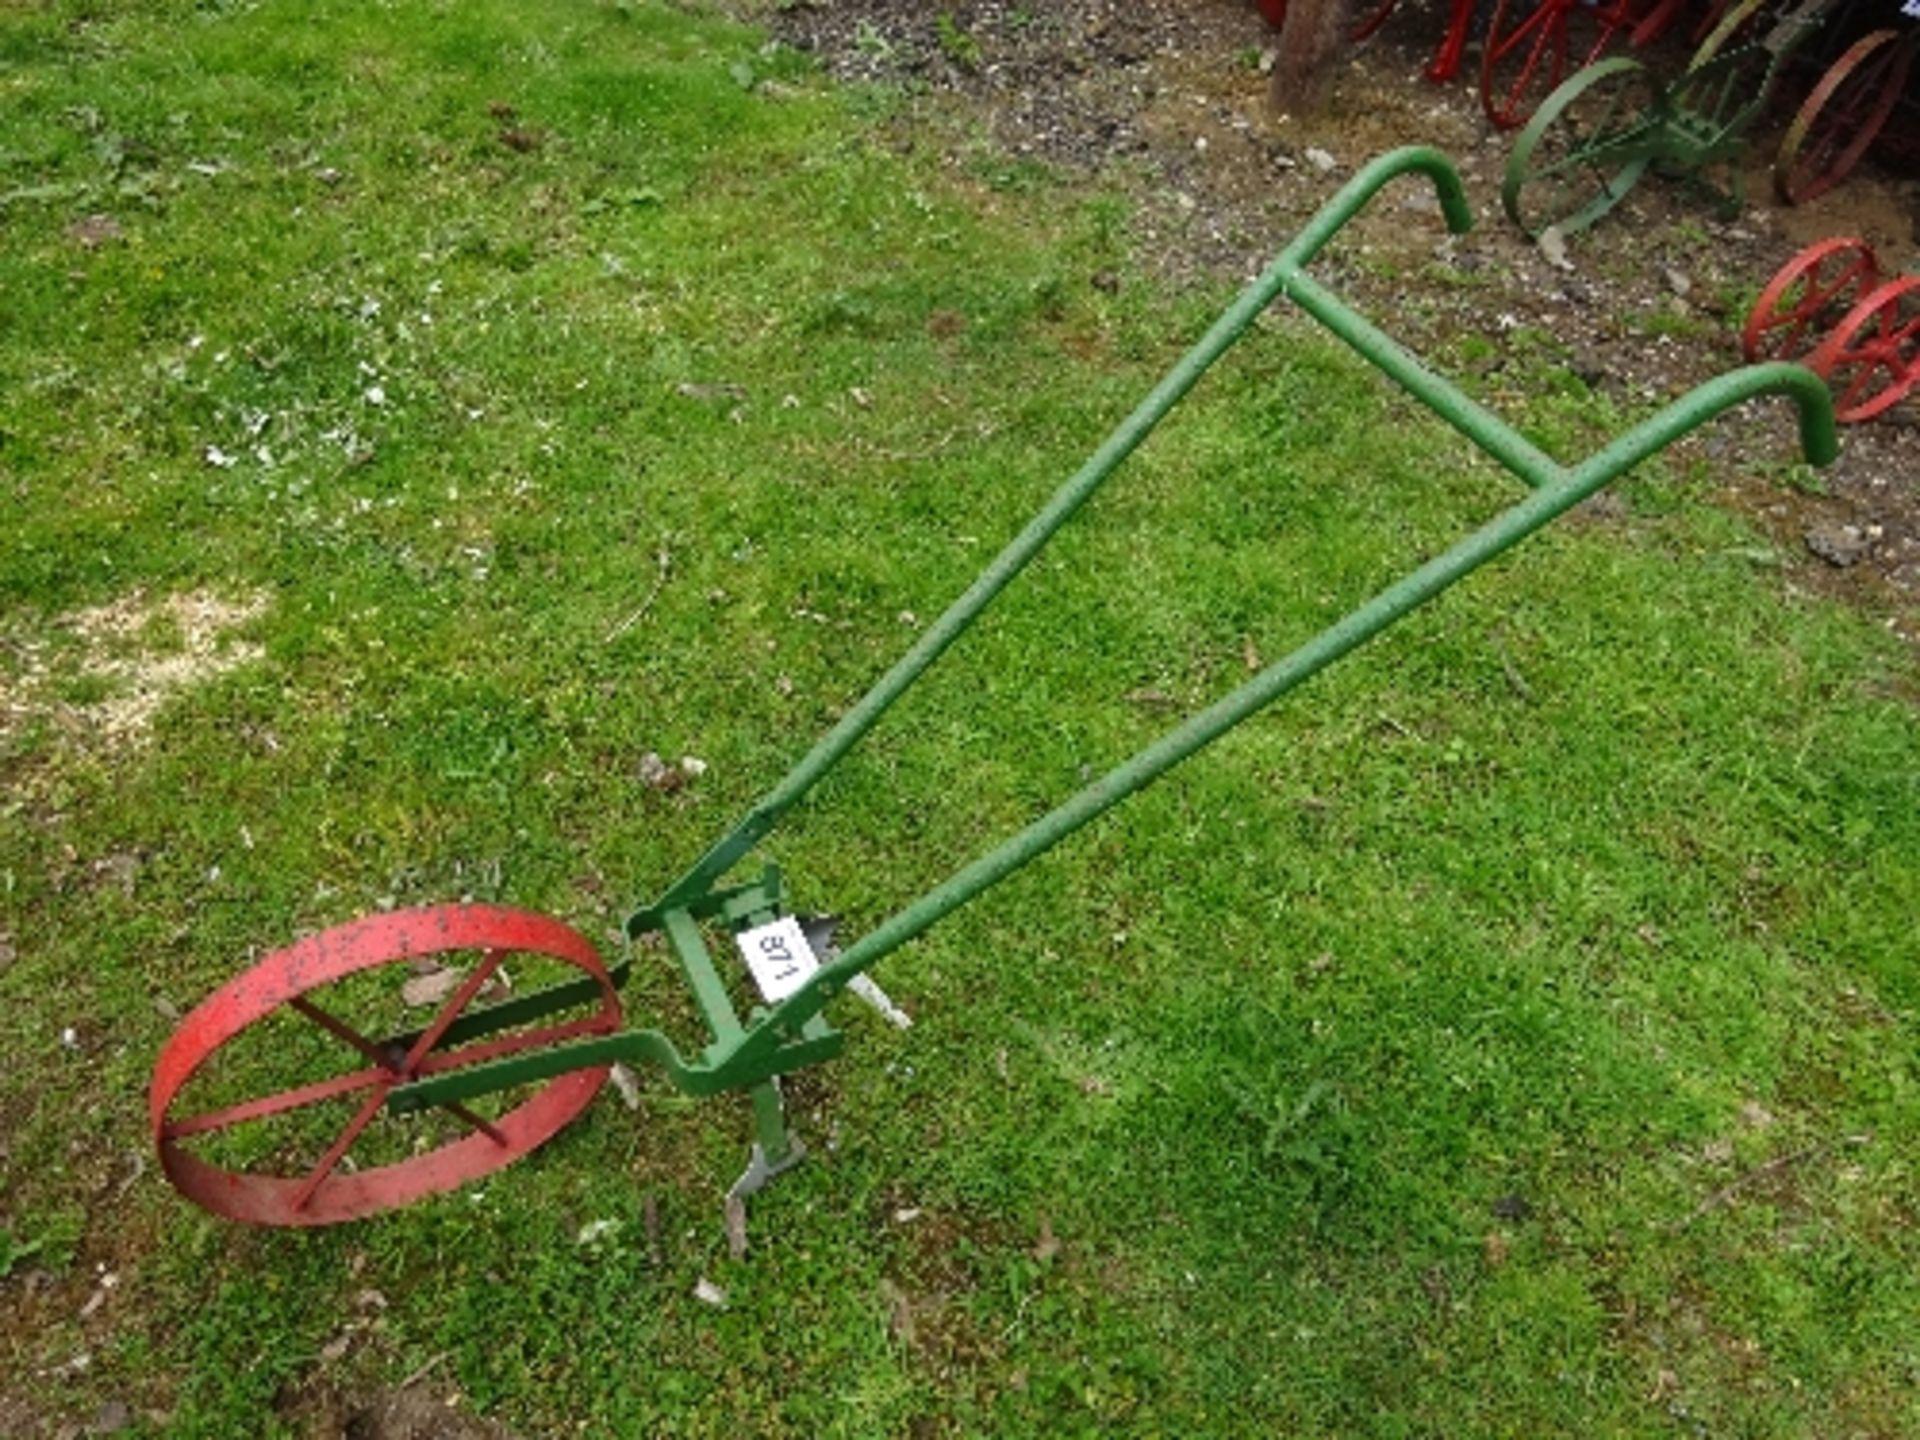 Lot 871 - Single row weeder